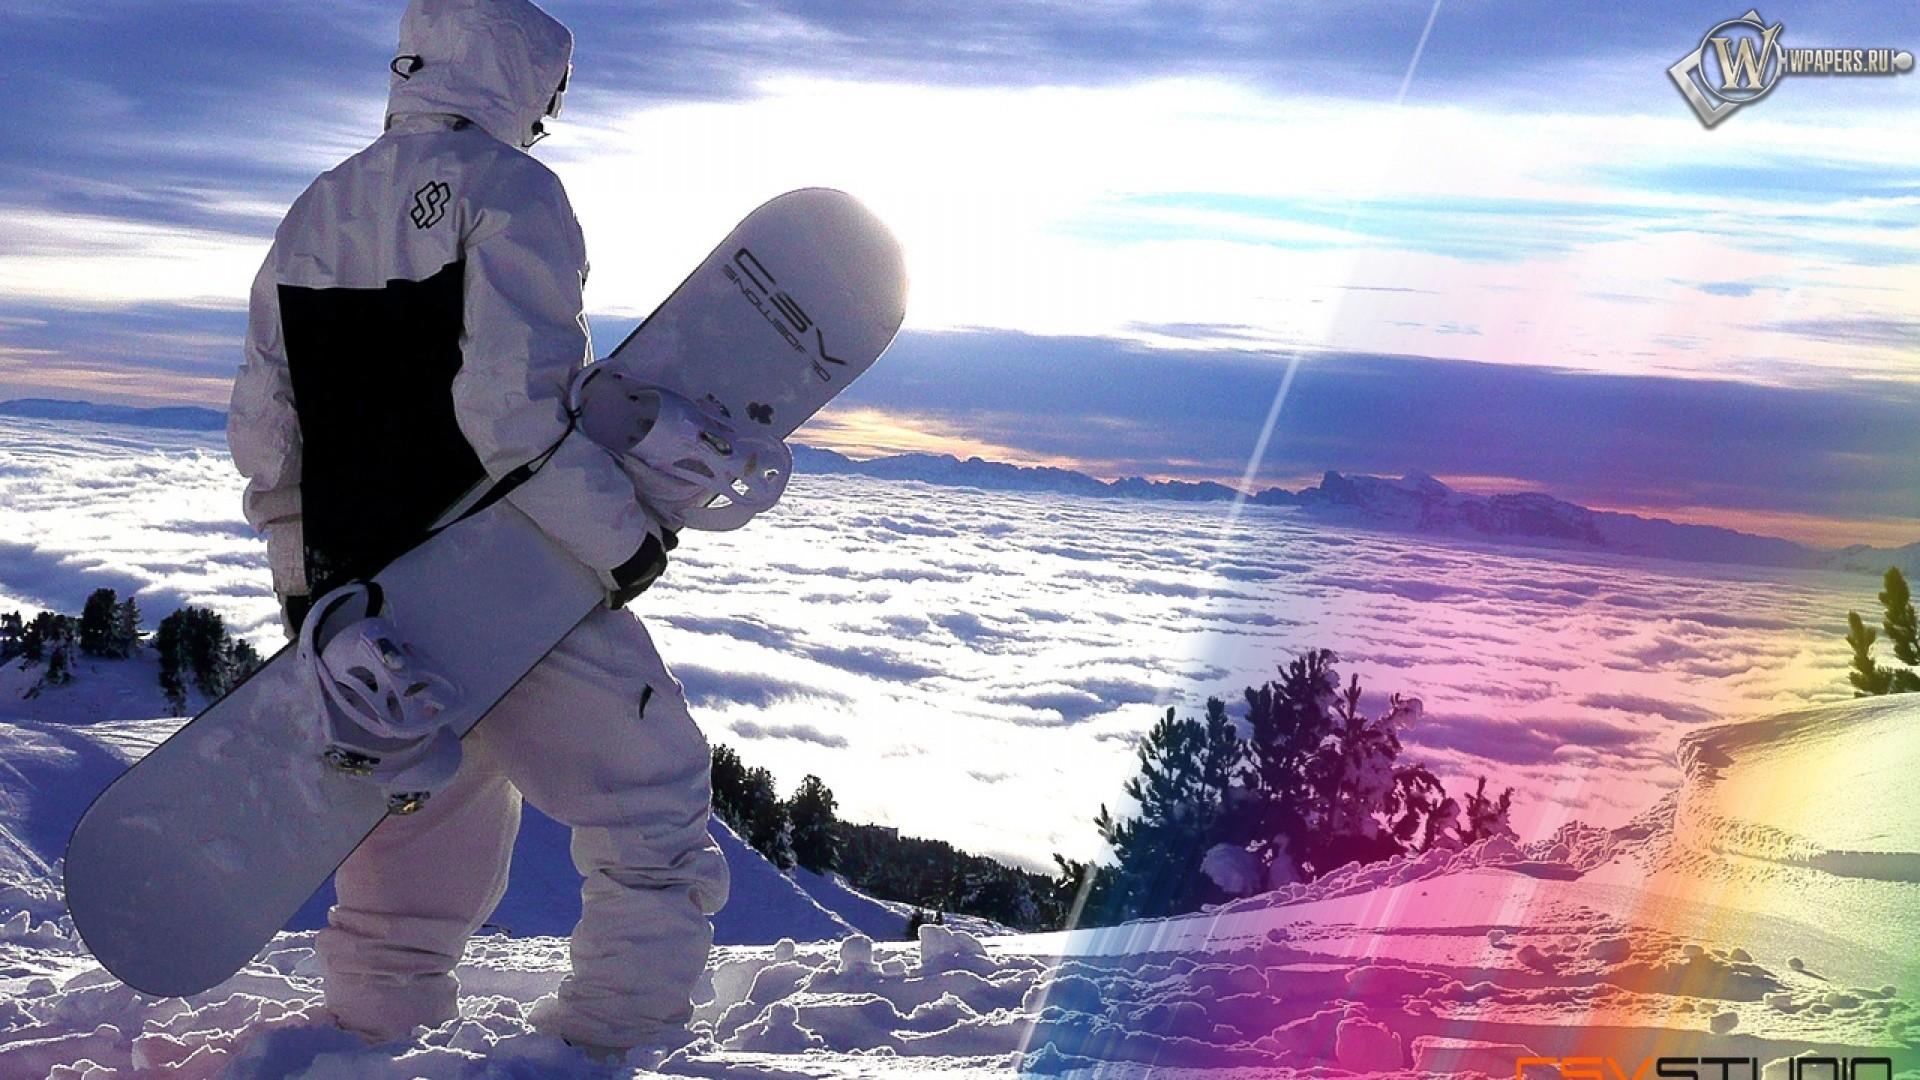 hd snowboarding wallpaper 72 images